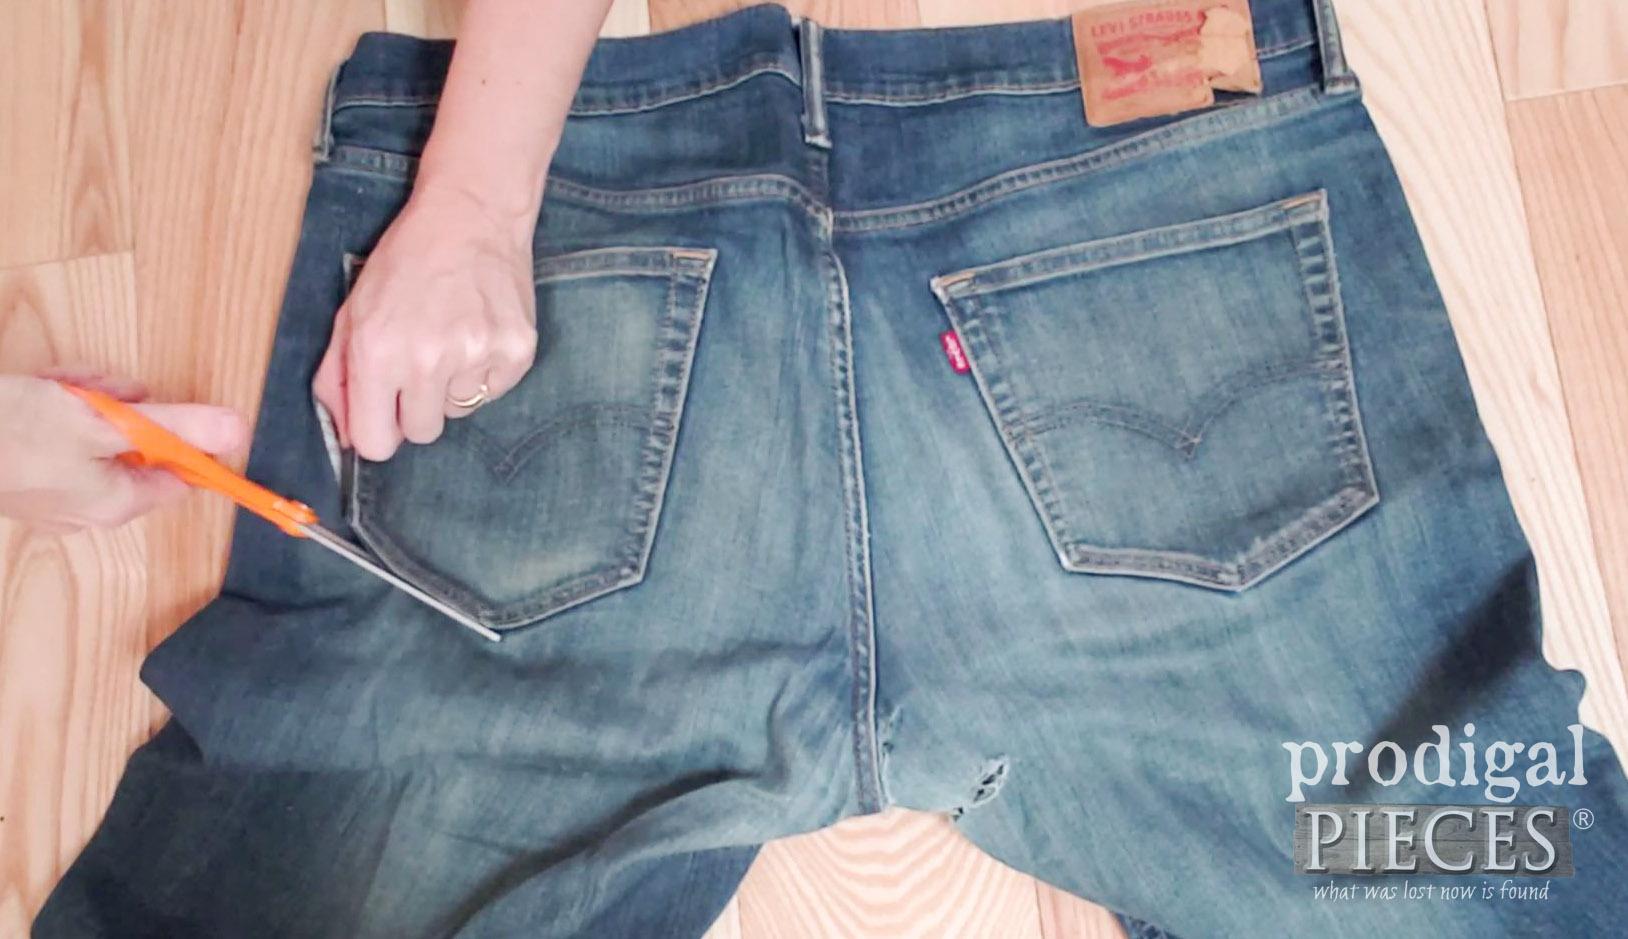 Cutting Jean Pockets for DIY Denim Pocket Purse   prodigalpieces.com #prodigalpieces